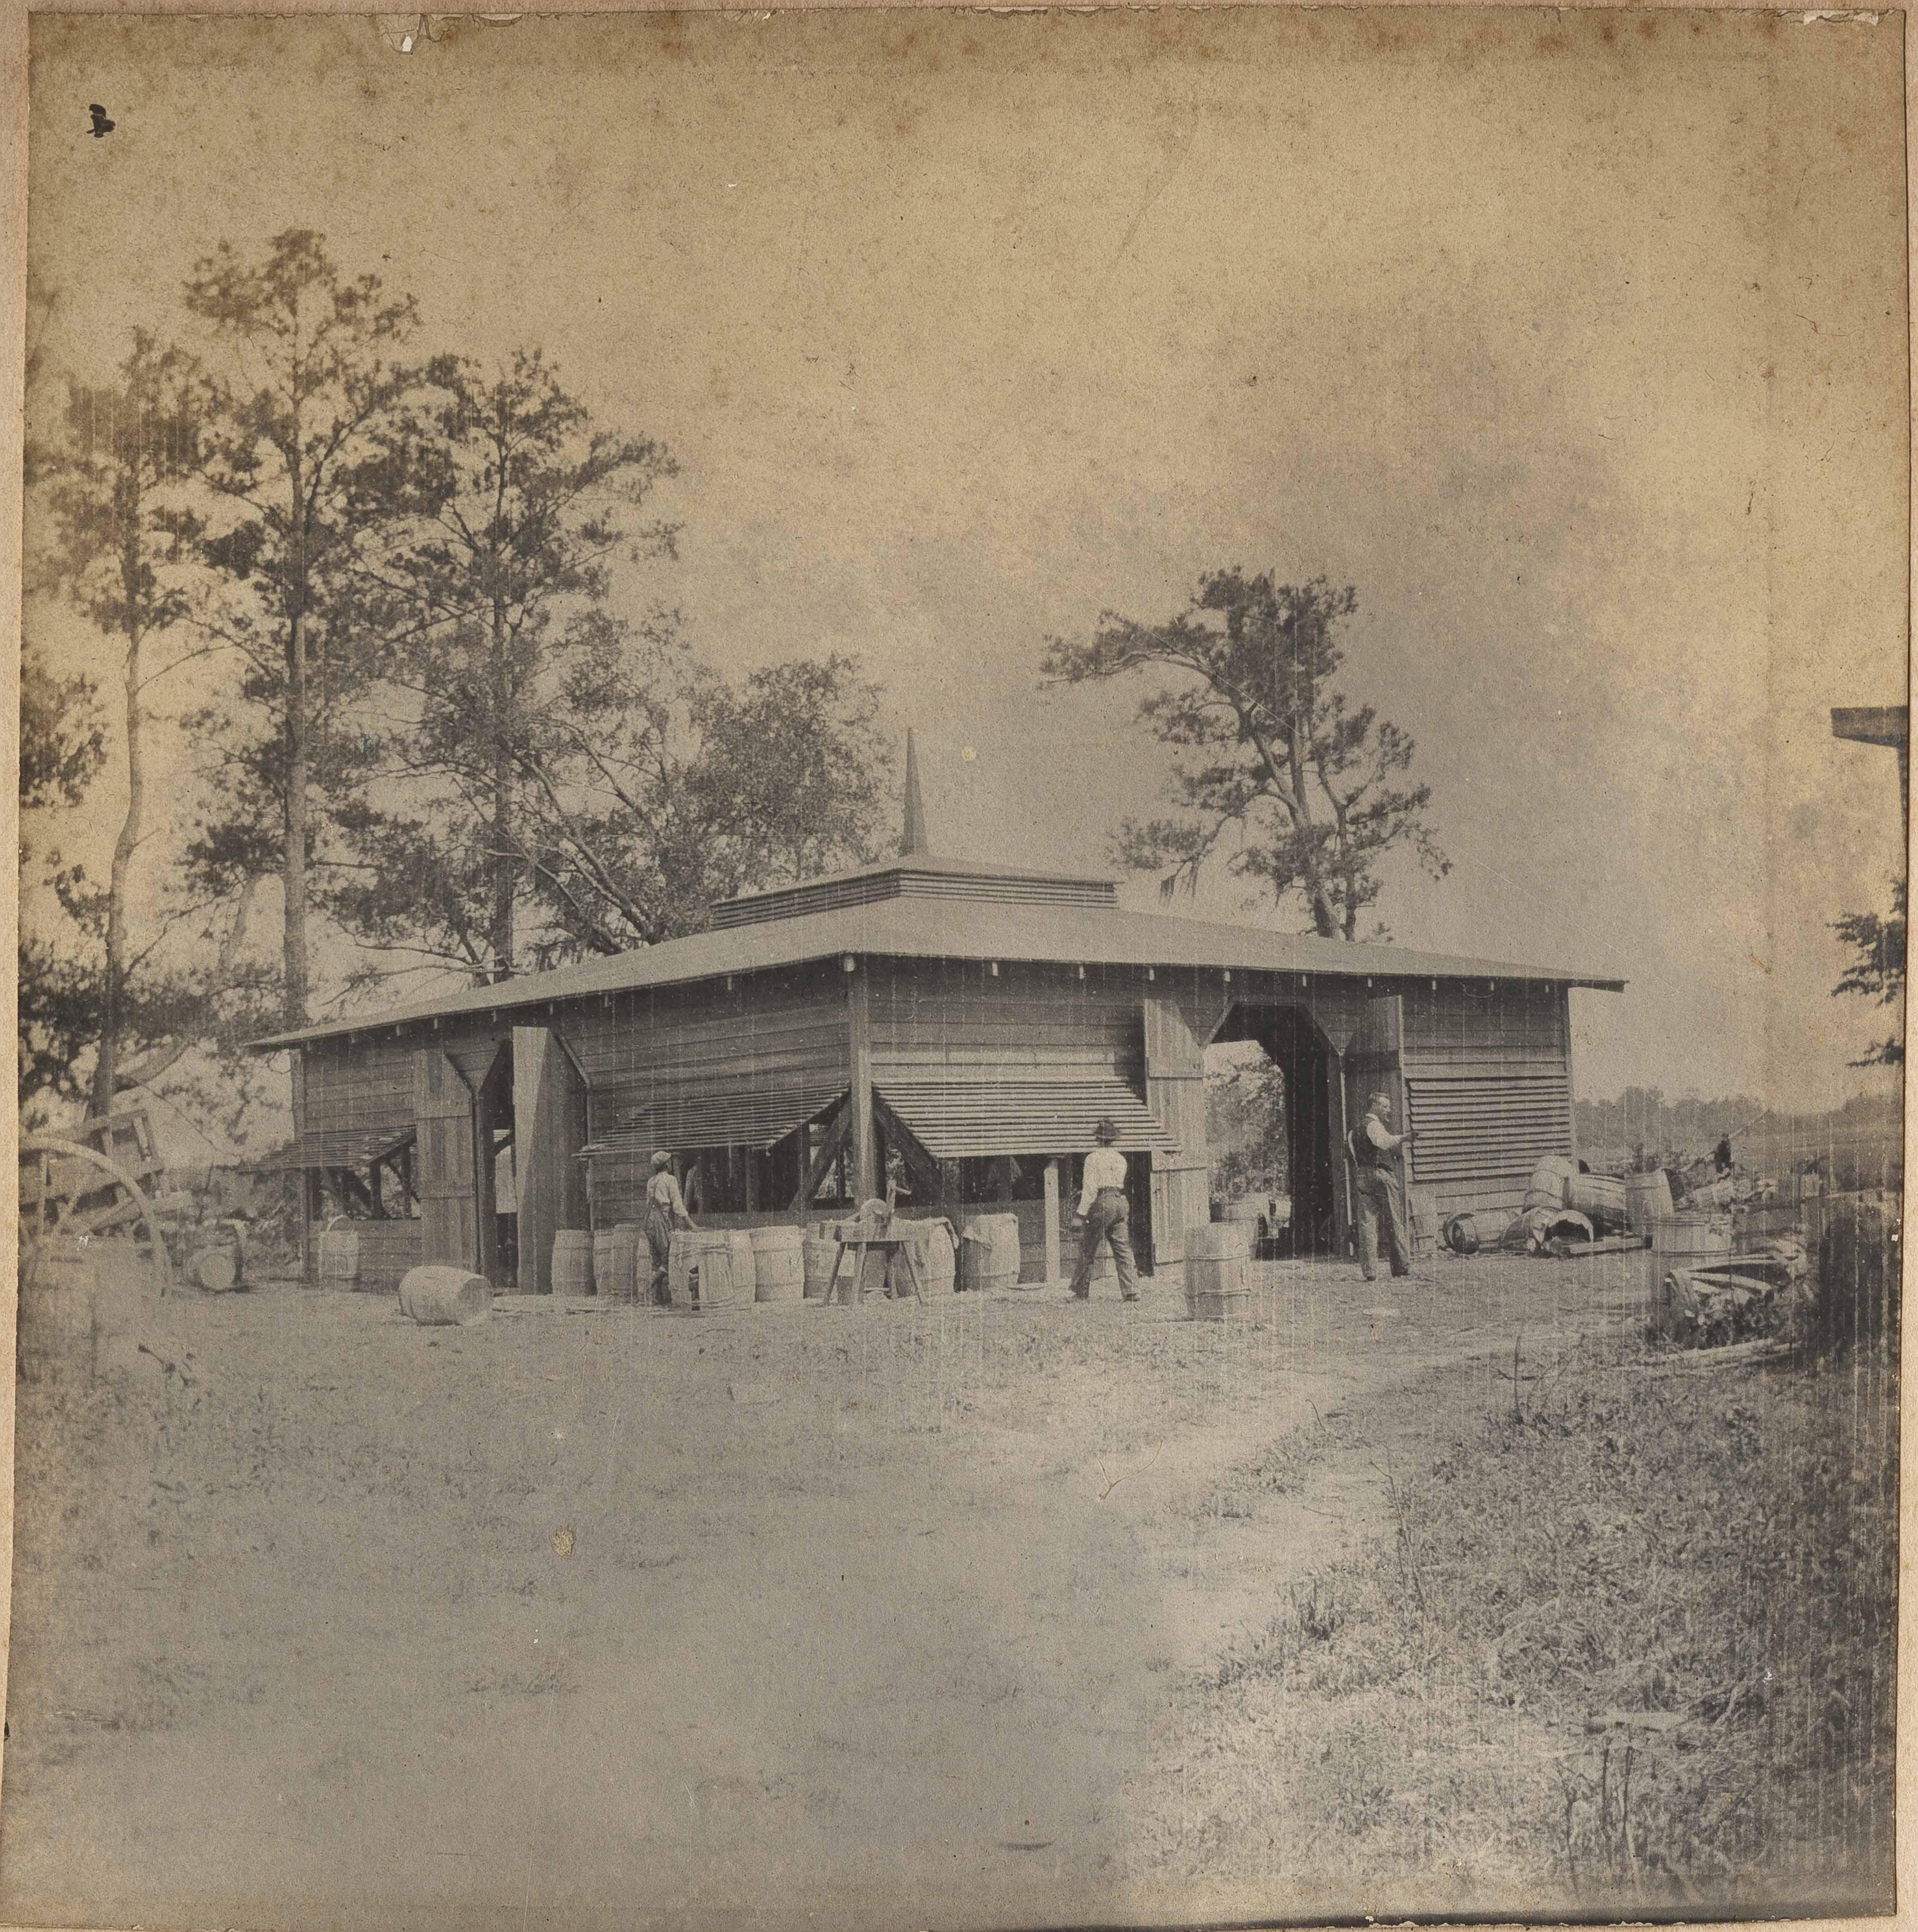 Barrels beside Packing shed at Halls Island